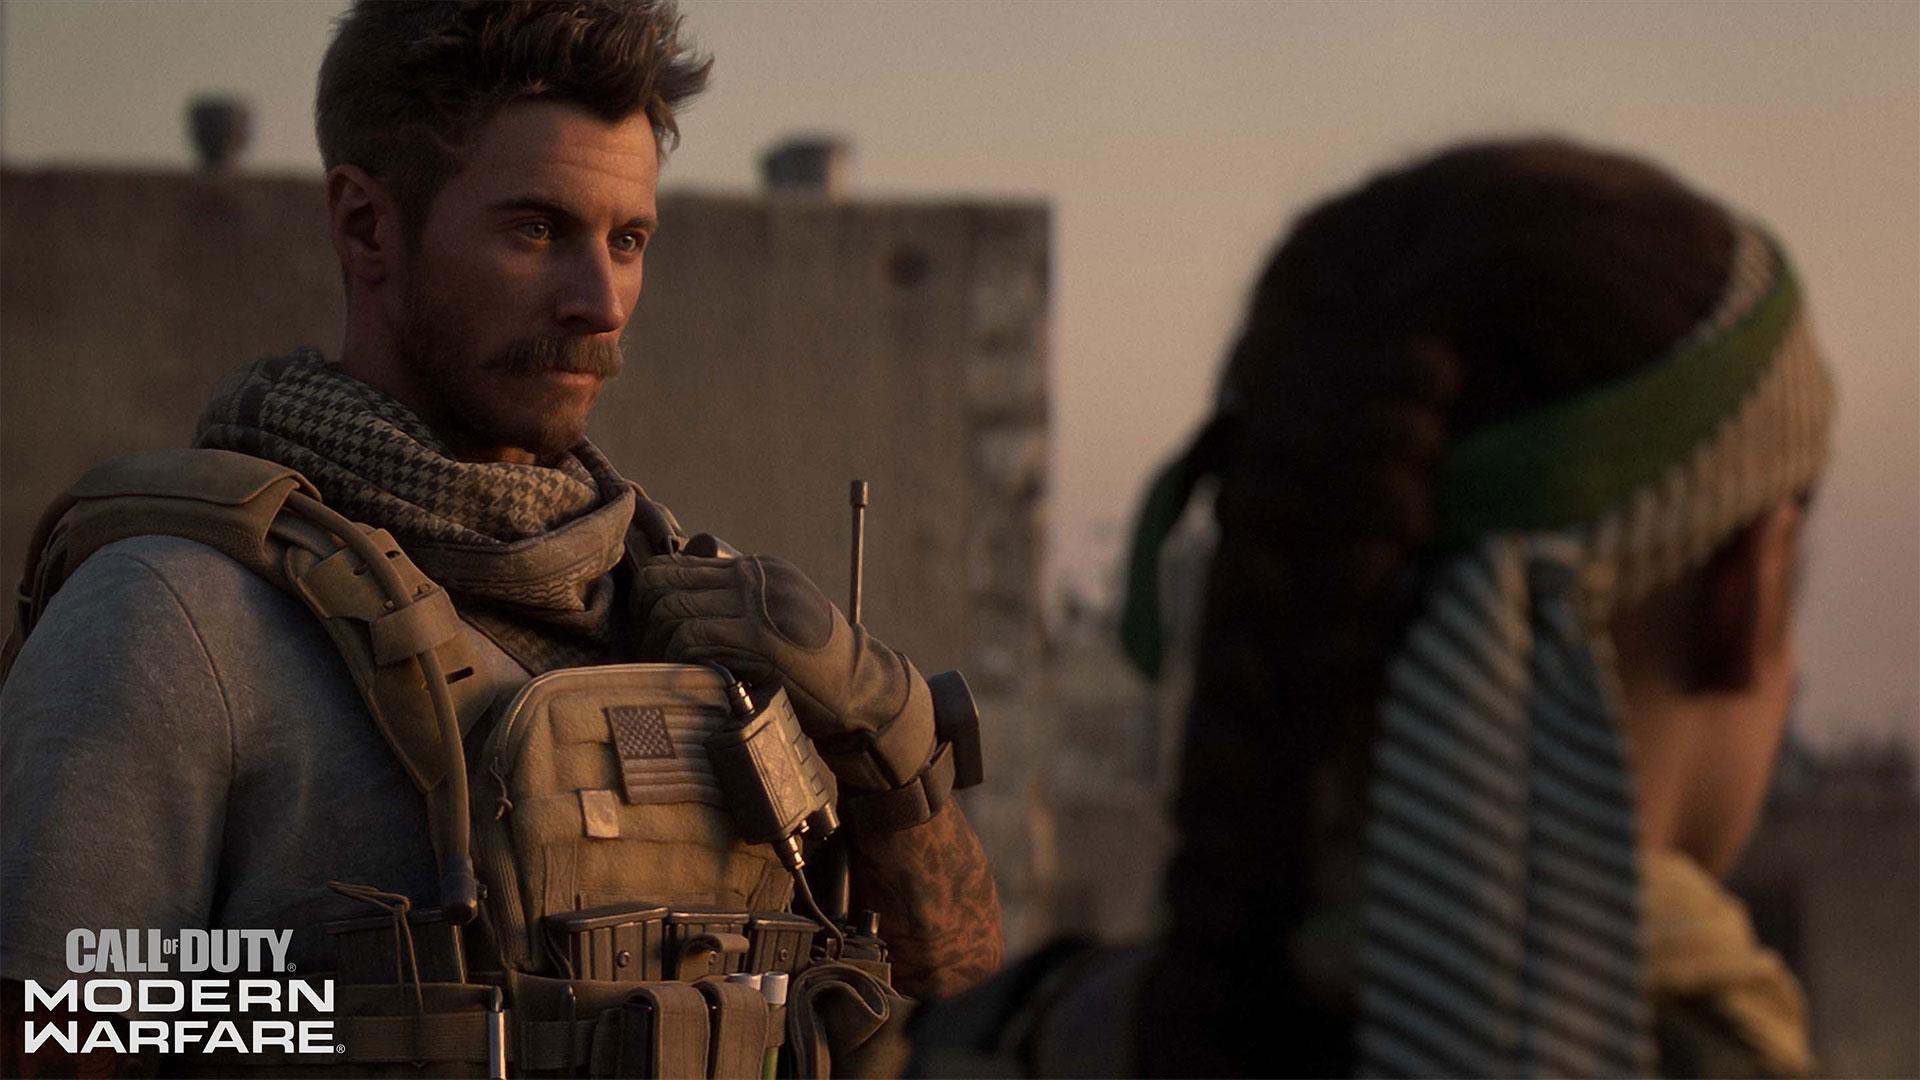 Test du solo de Call of Duty Modern Warfare : la meilleure campagne de la franchise